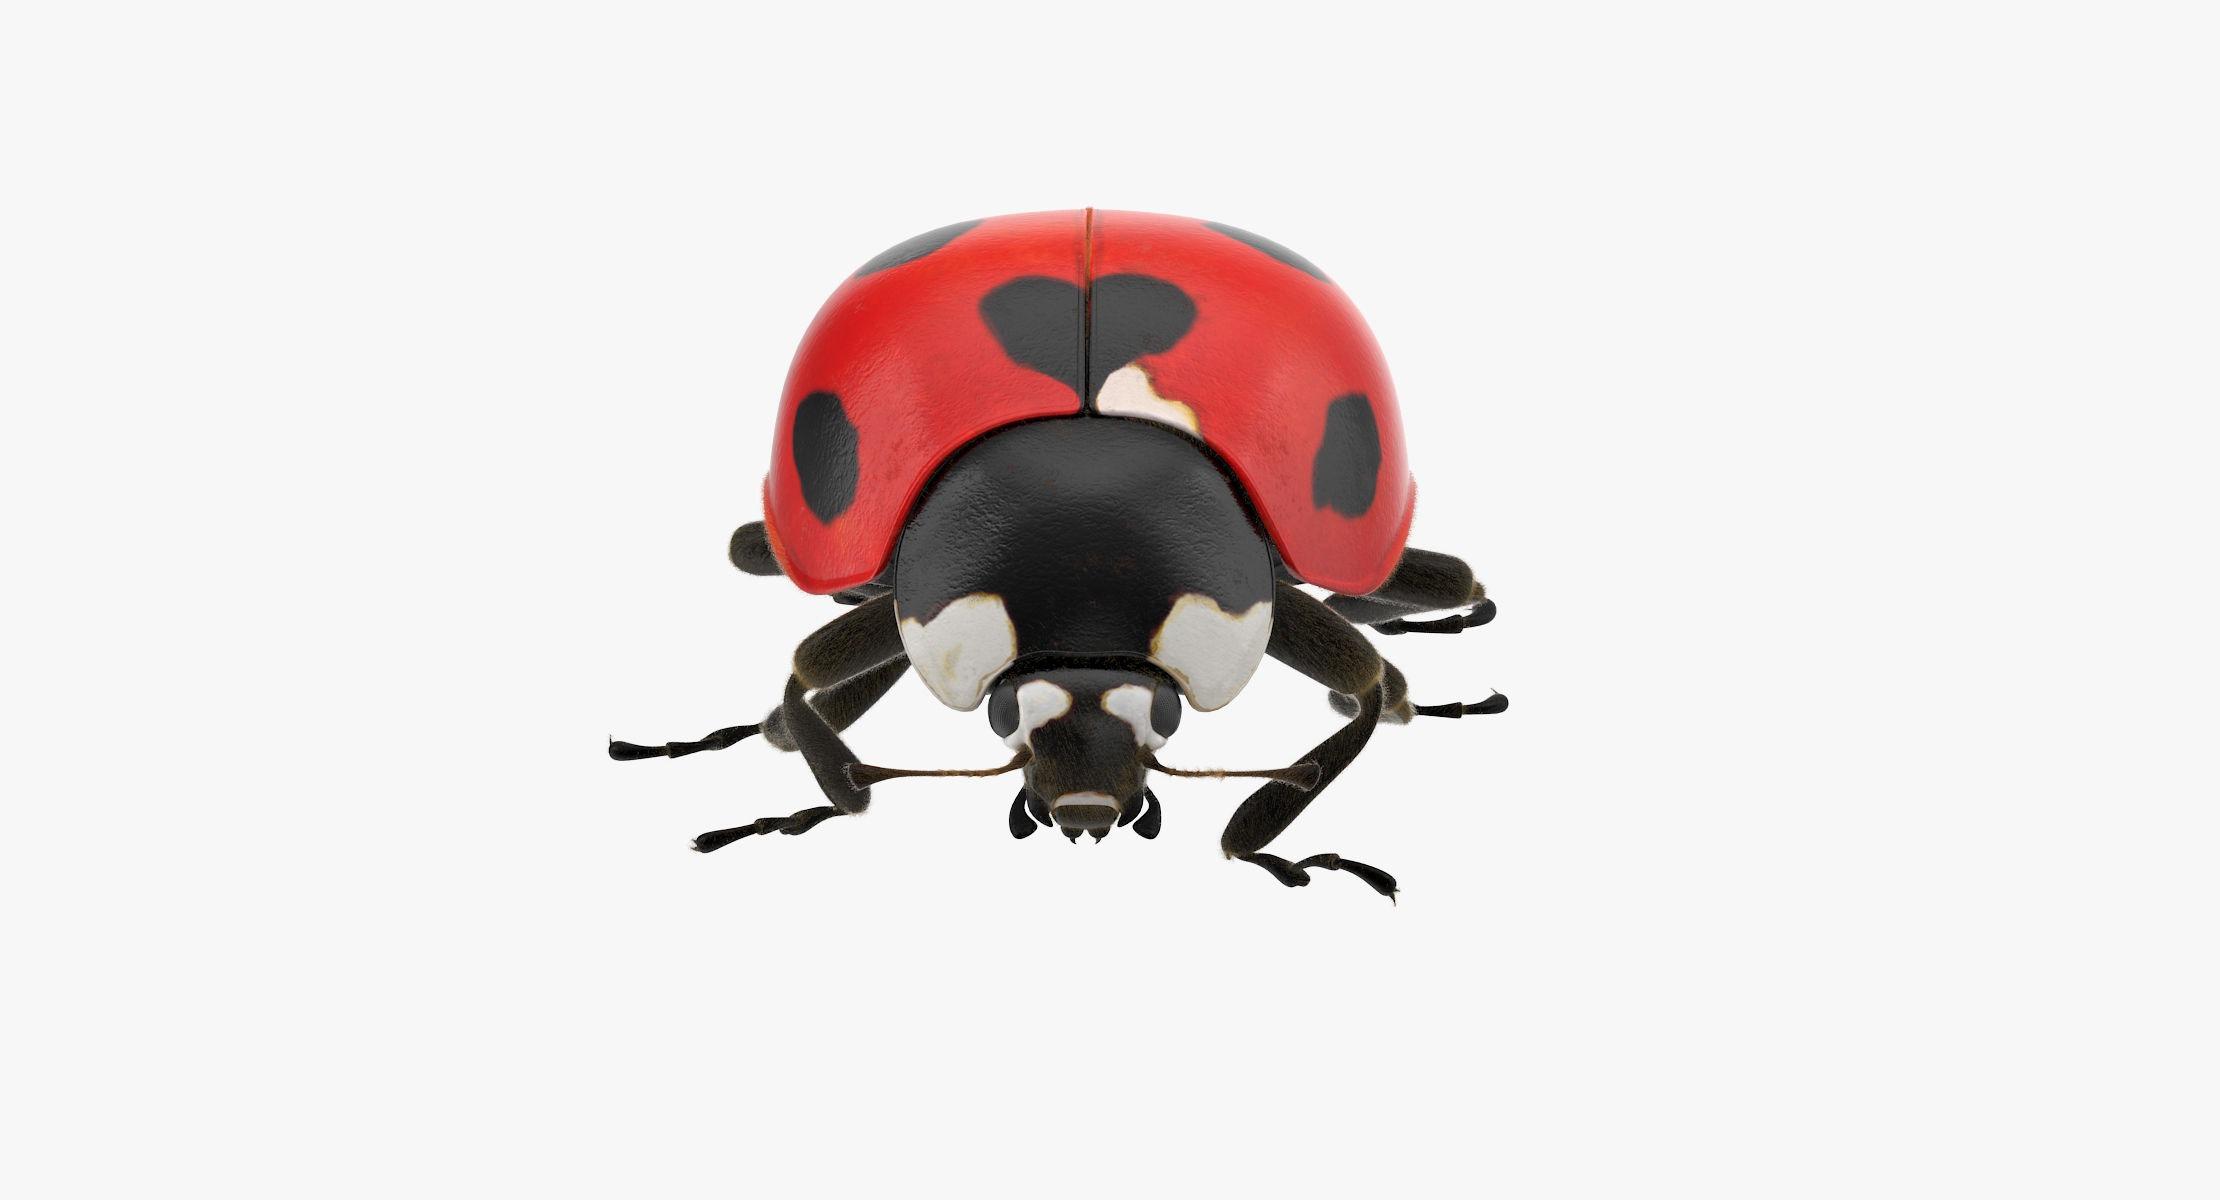 Ladybug 01 - reel 1